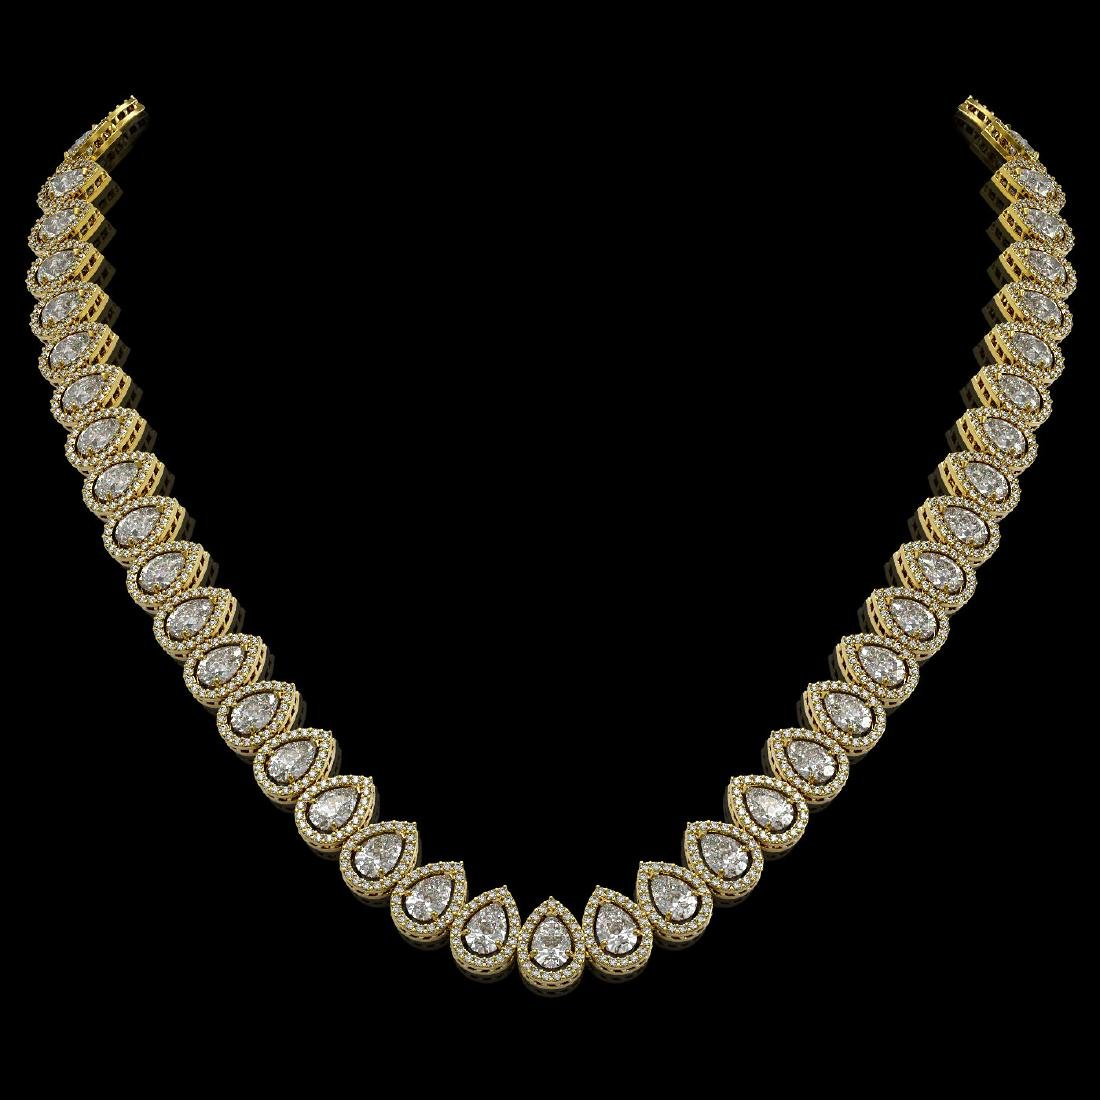 34.83 CTW Pear Diamond Designer Necklace 18K Yellow